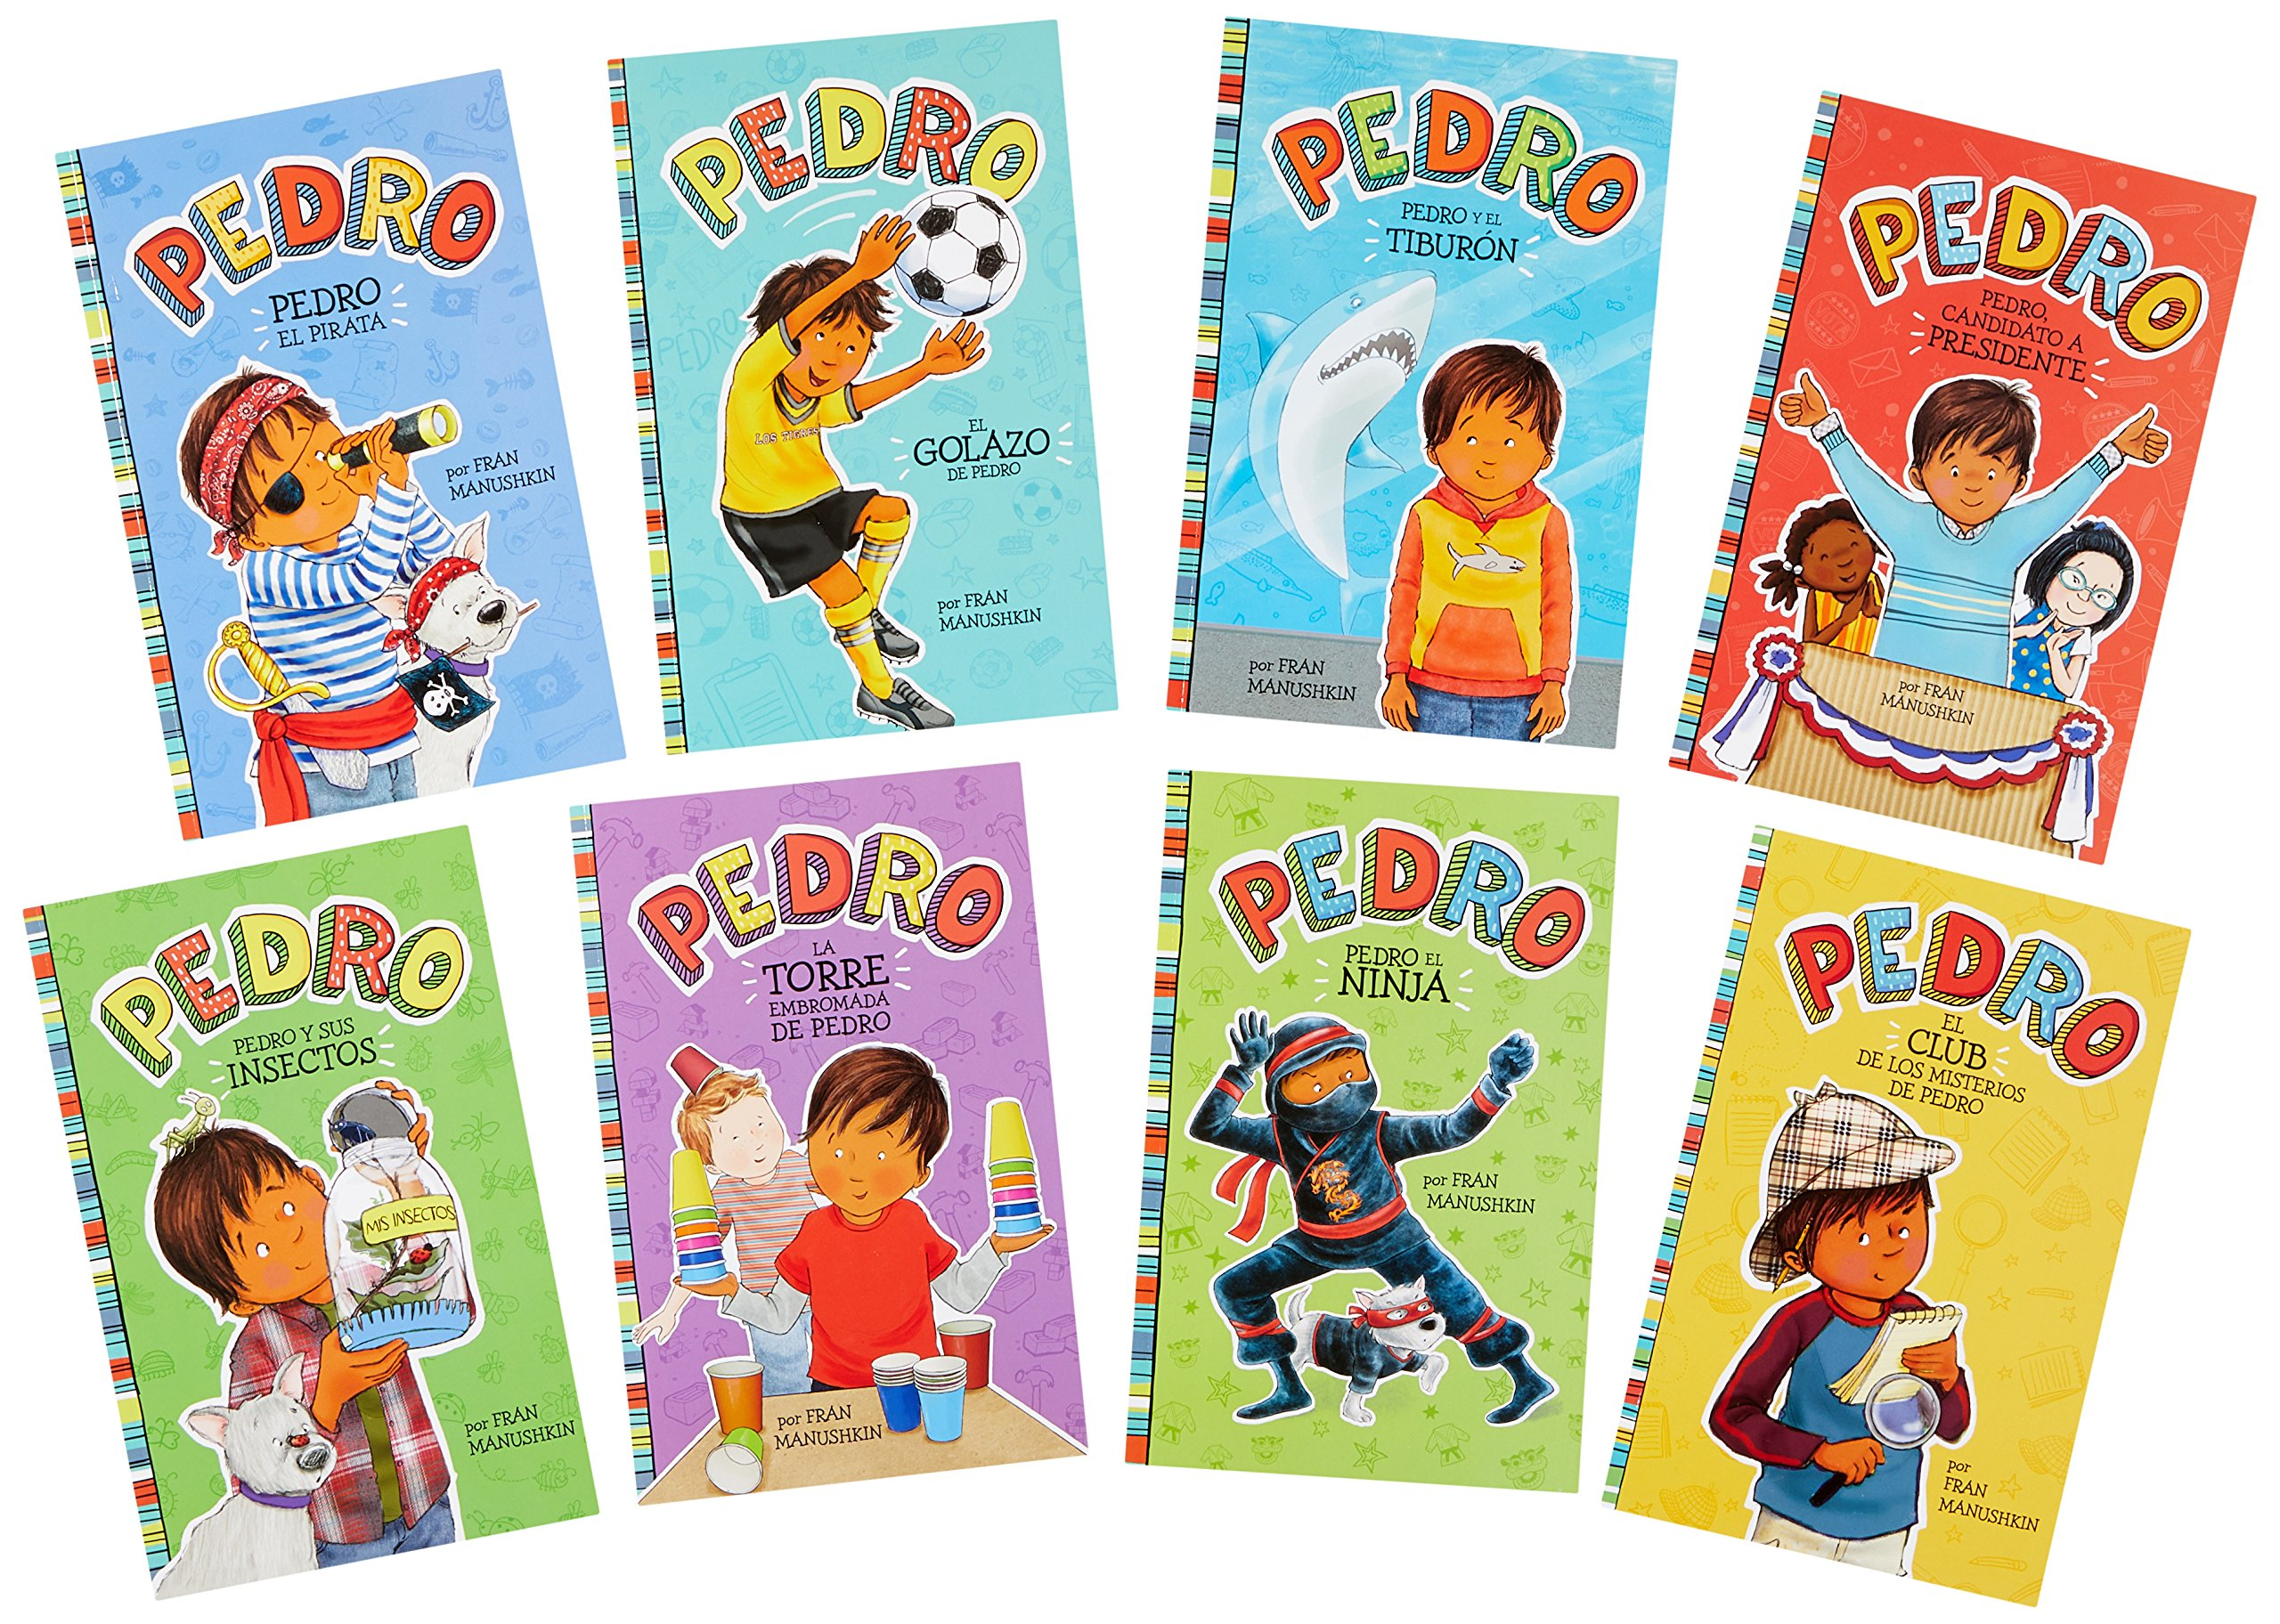 Pedro en español (Spanish Edition): Fran Manushkin, Tammie ...